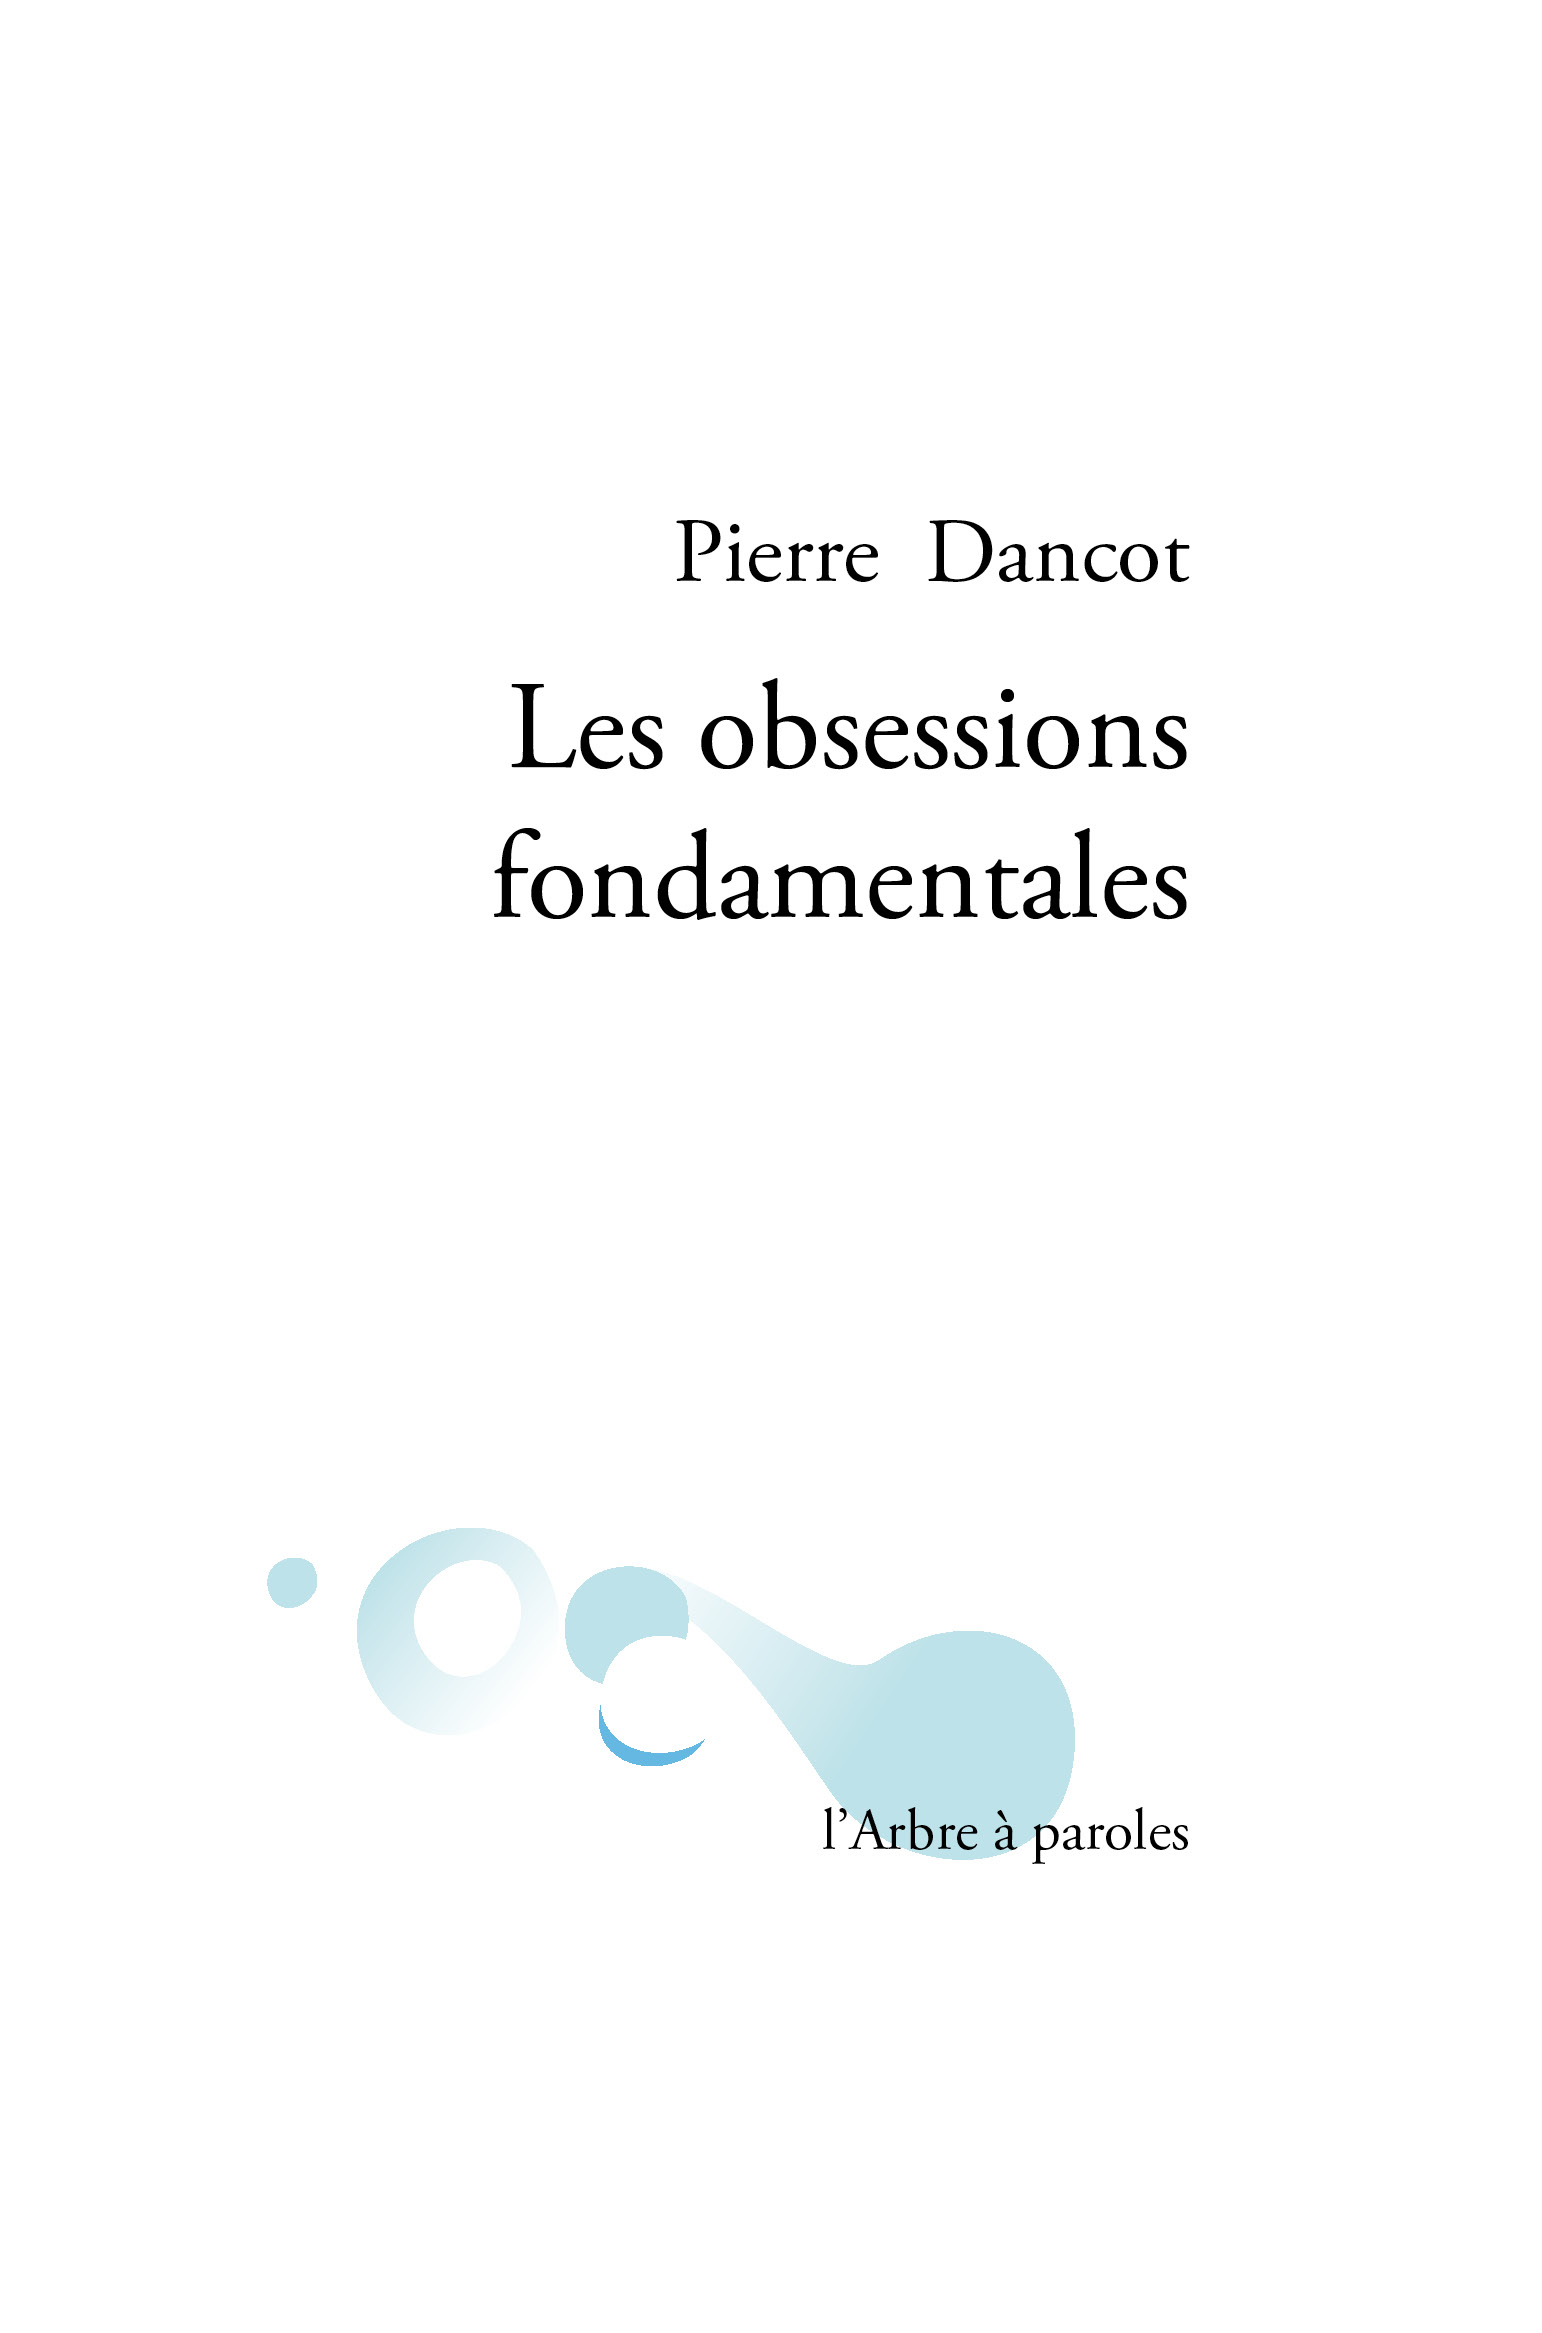 Pierre Dancot Obsessions fondamentales